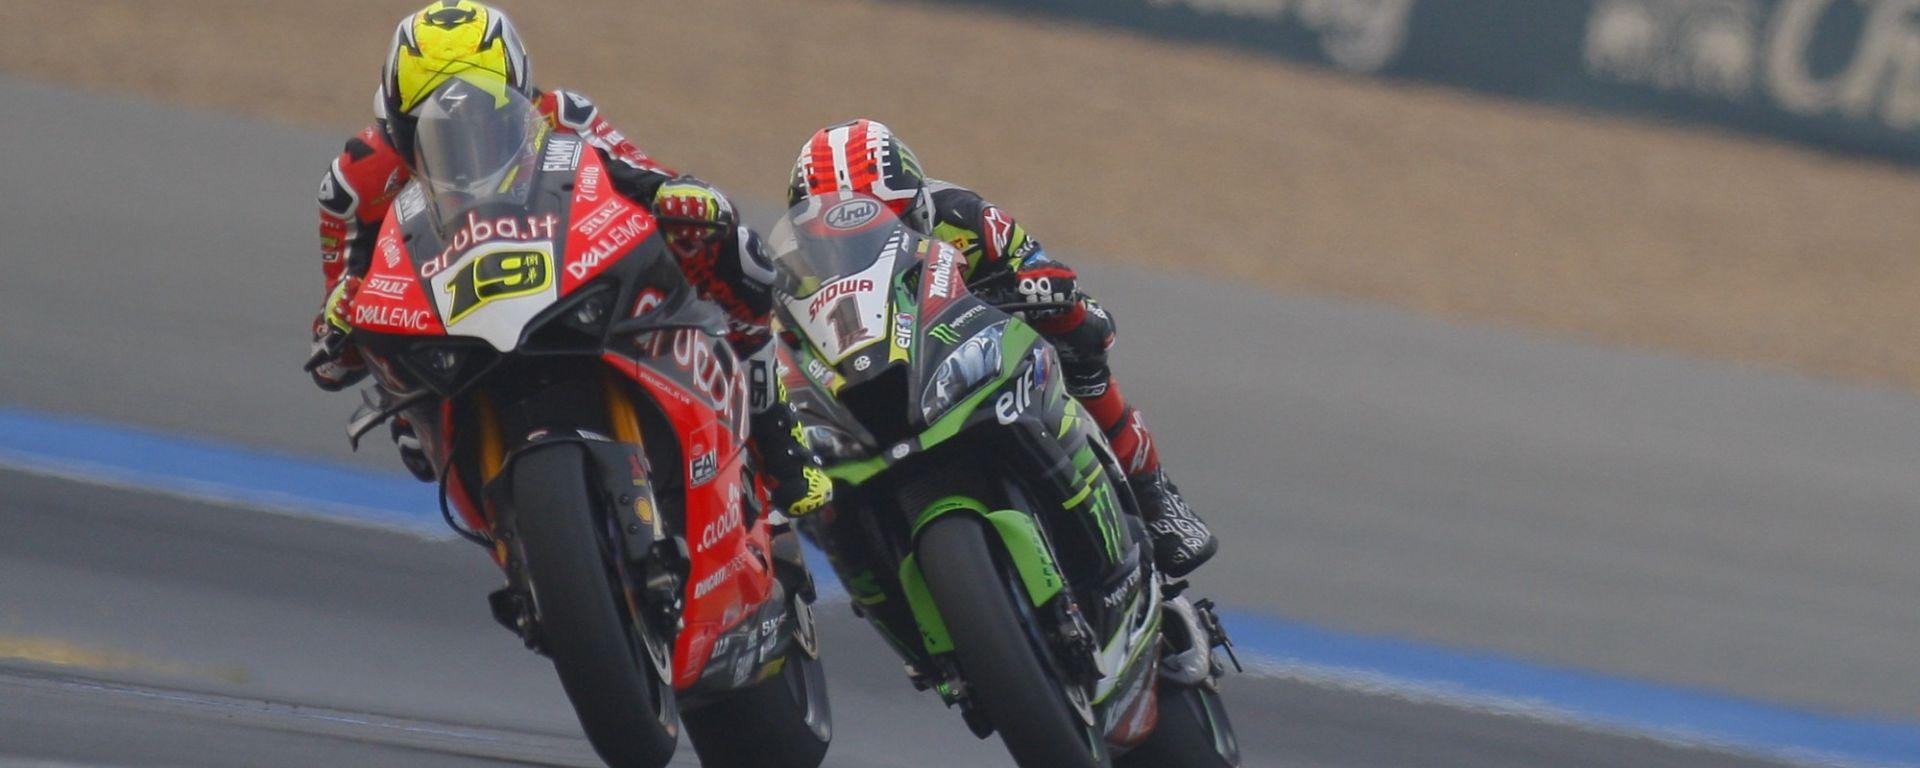 Alvaro Bautista (Ducati) e Jonathan Rea (Kawasaki)